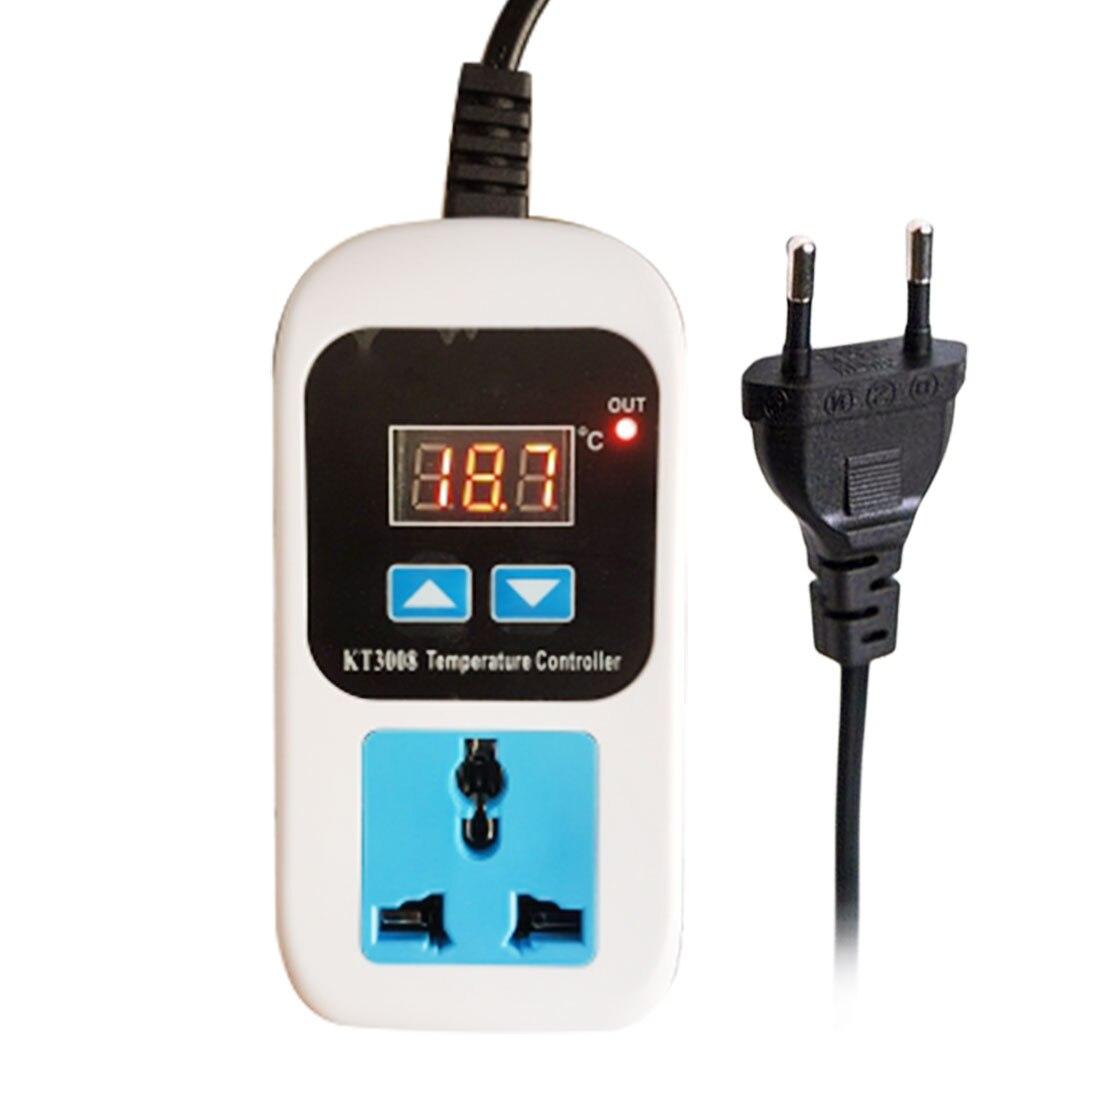 Regulador Controlador de Temperatura Microcomputador Tomada AC110-220V + Sensor NTC KT3008 KT3009A Termostato Digital DA UE Plugue